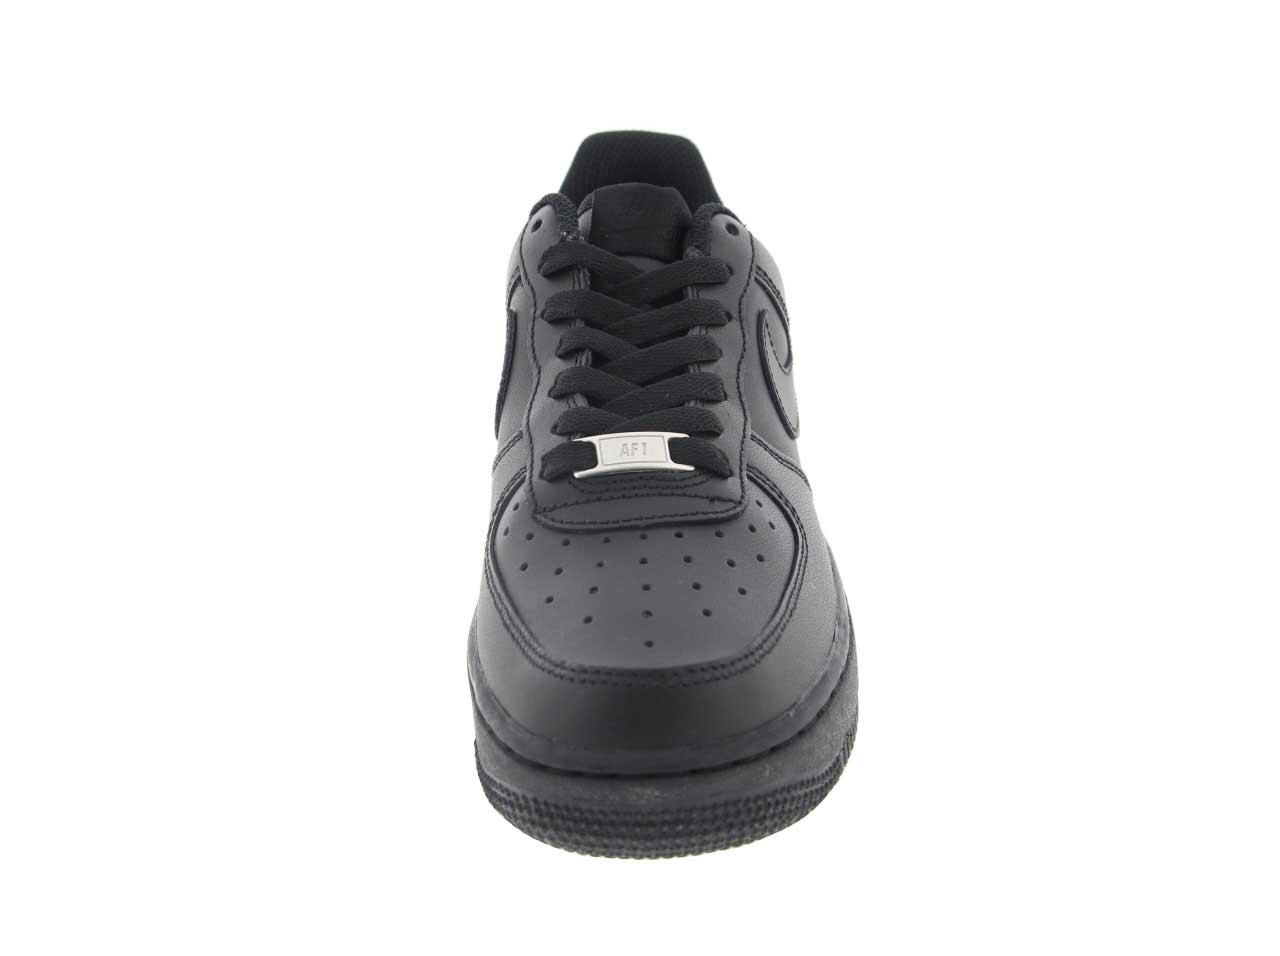 NIKE WMNS AIR FORCE 1 07 - BLACK/BLACK